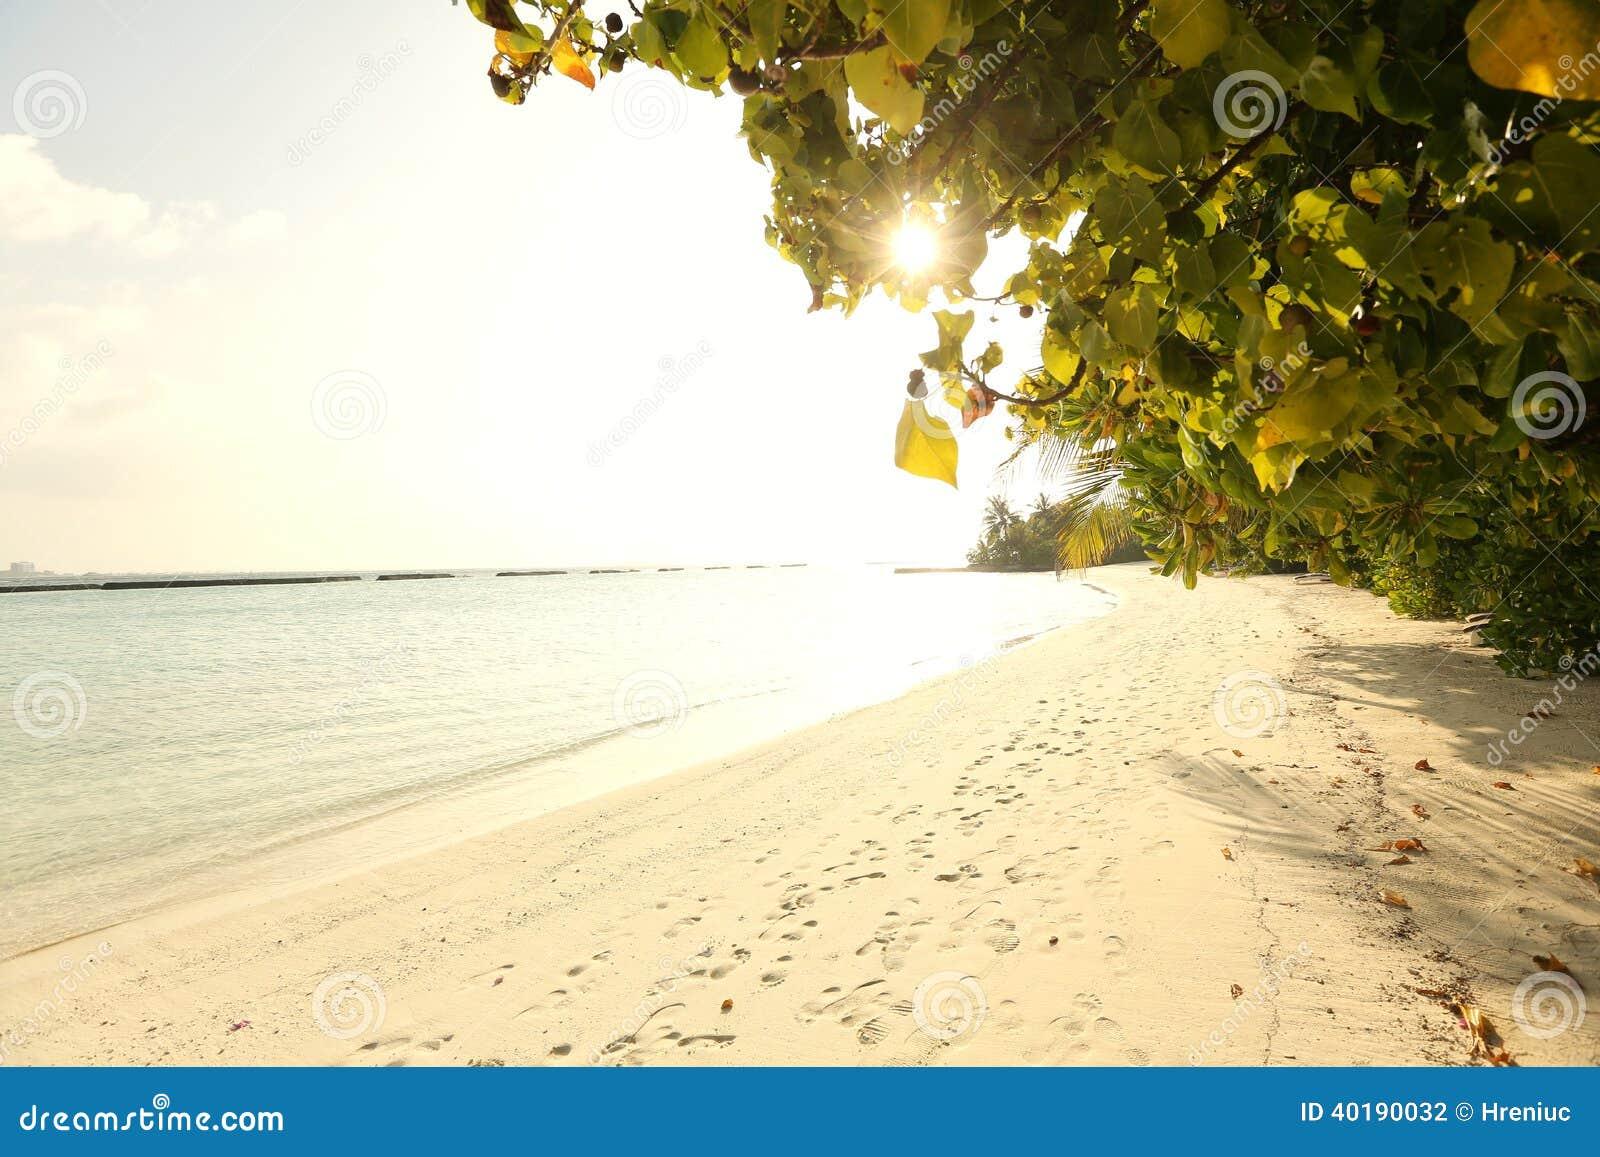 Trees in Maldives near sunny beach sand